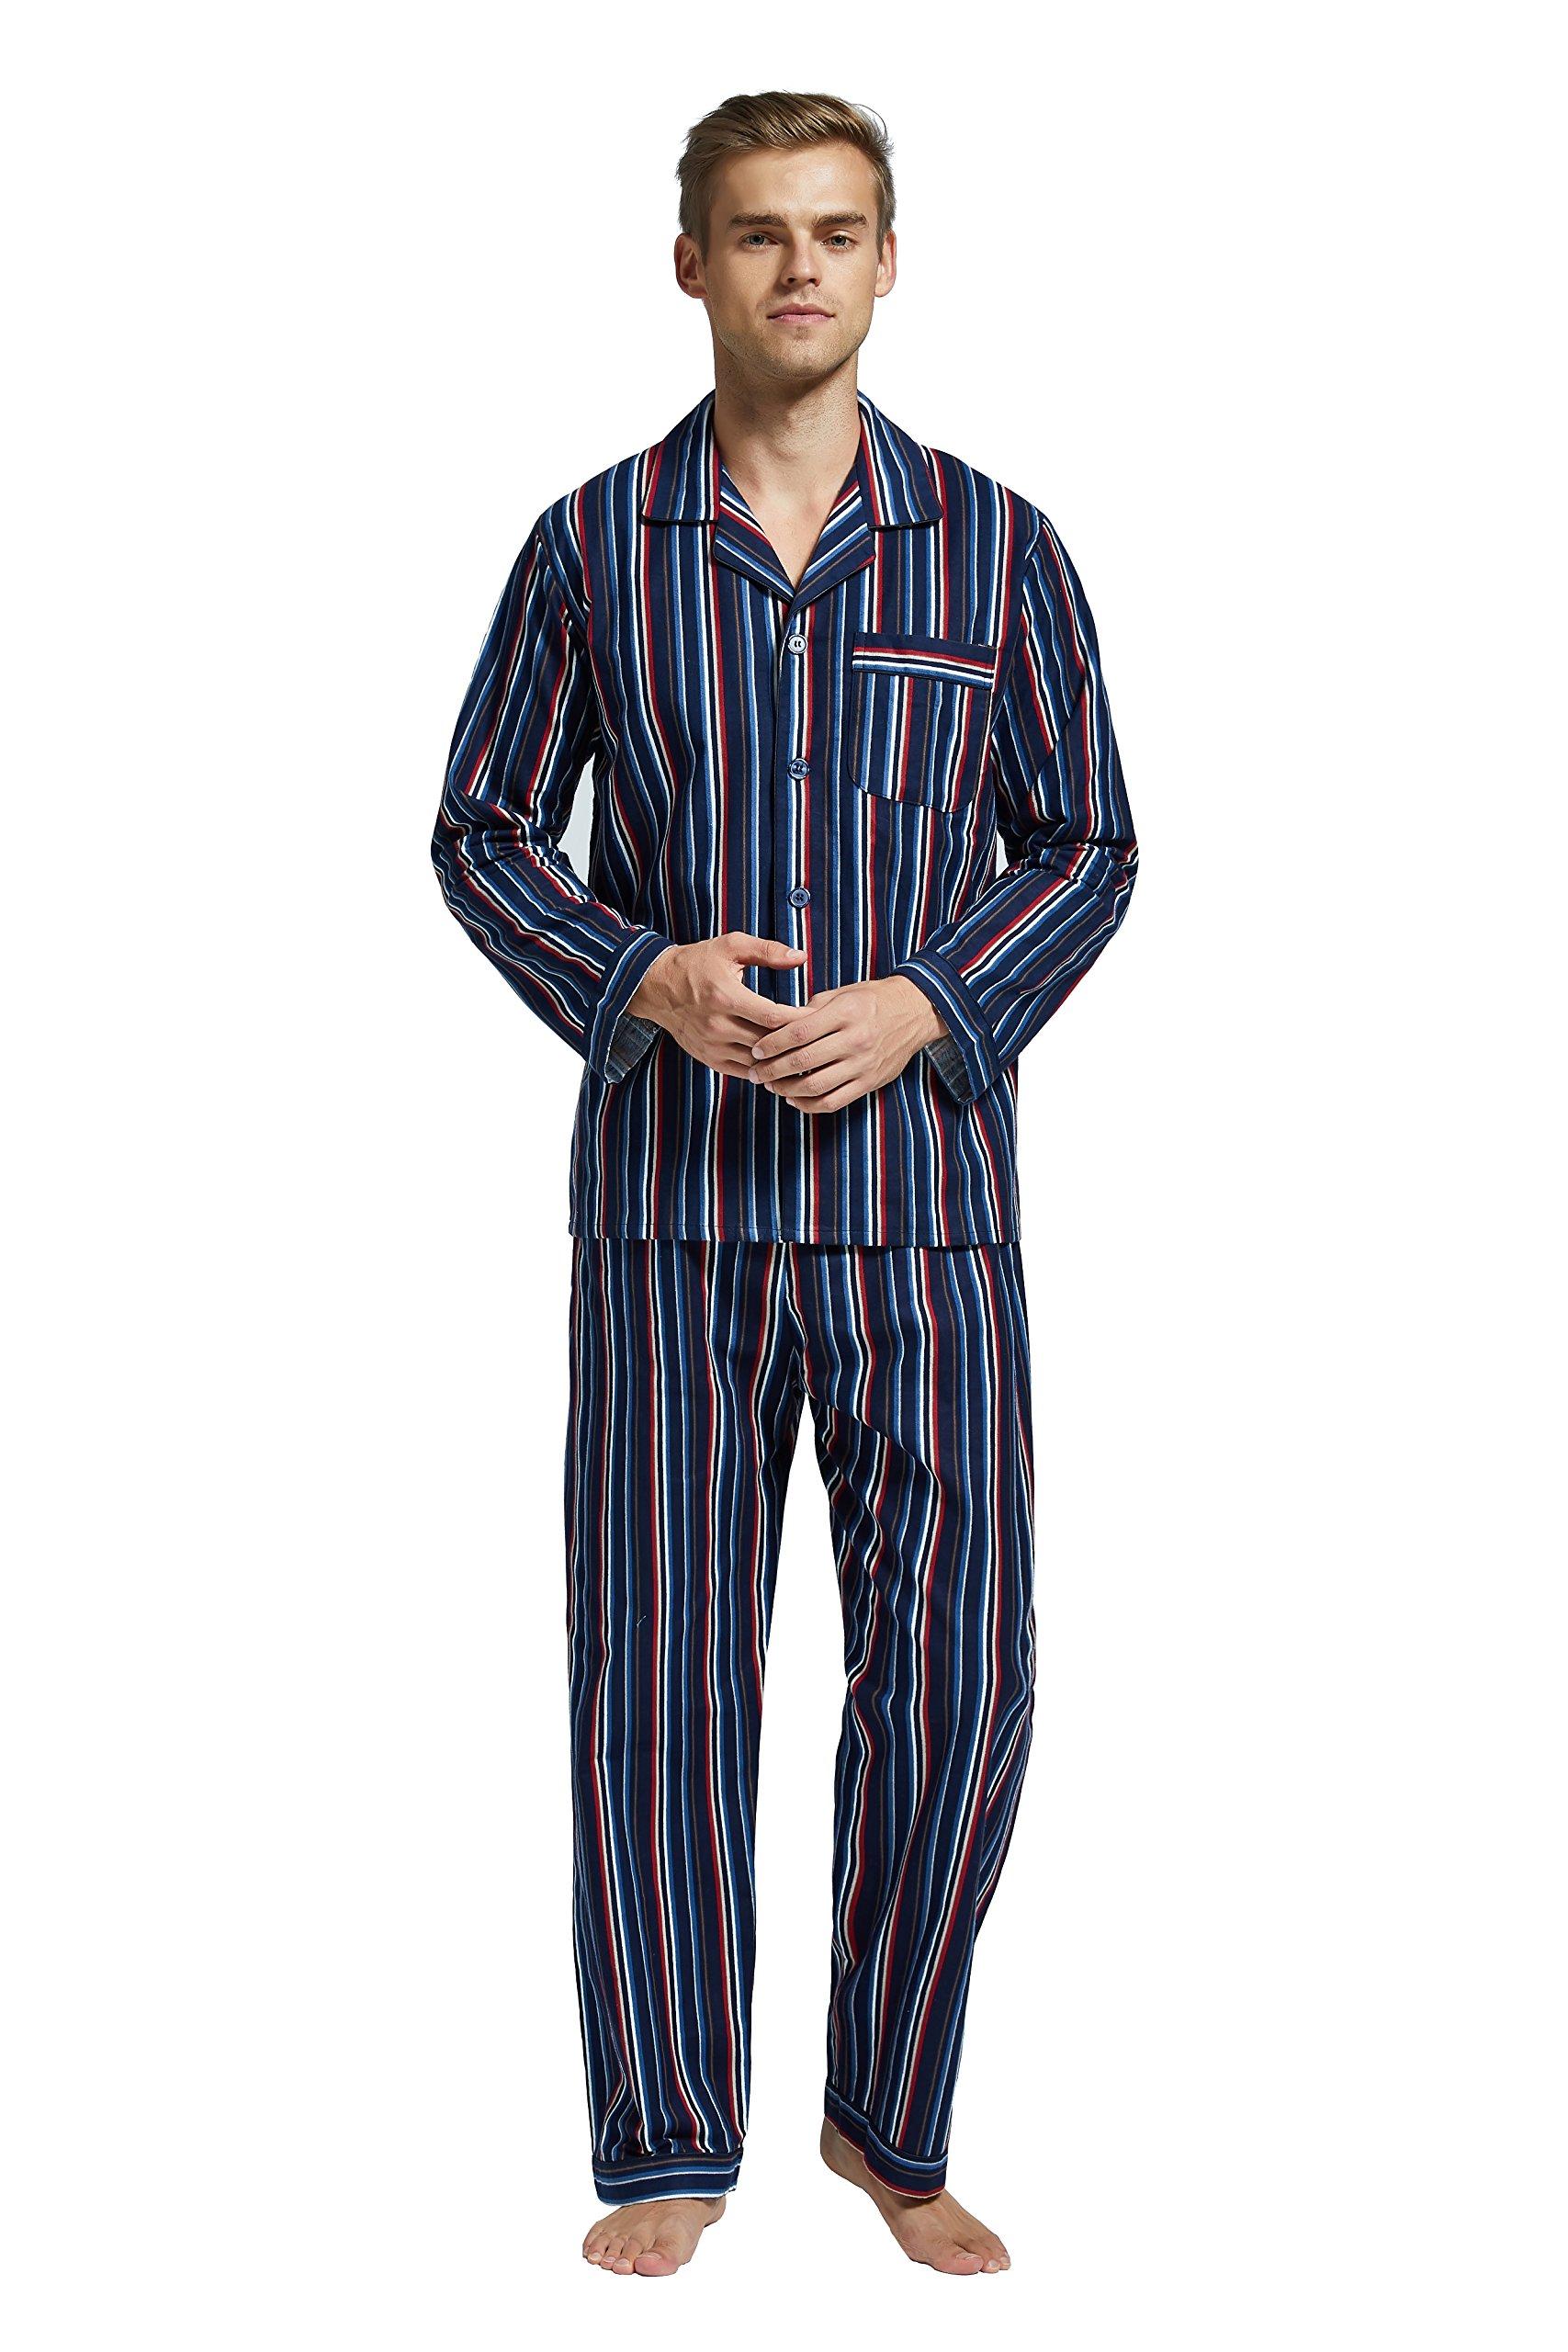 TONY AND CANDICE Men's Flannel Pajama Set, 100% Cotton Long Sleeve Sleepwear (Medium, Multicolor Striped)